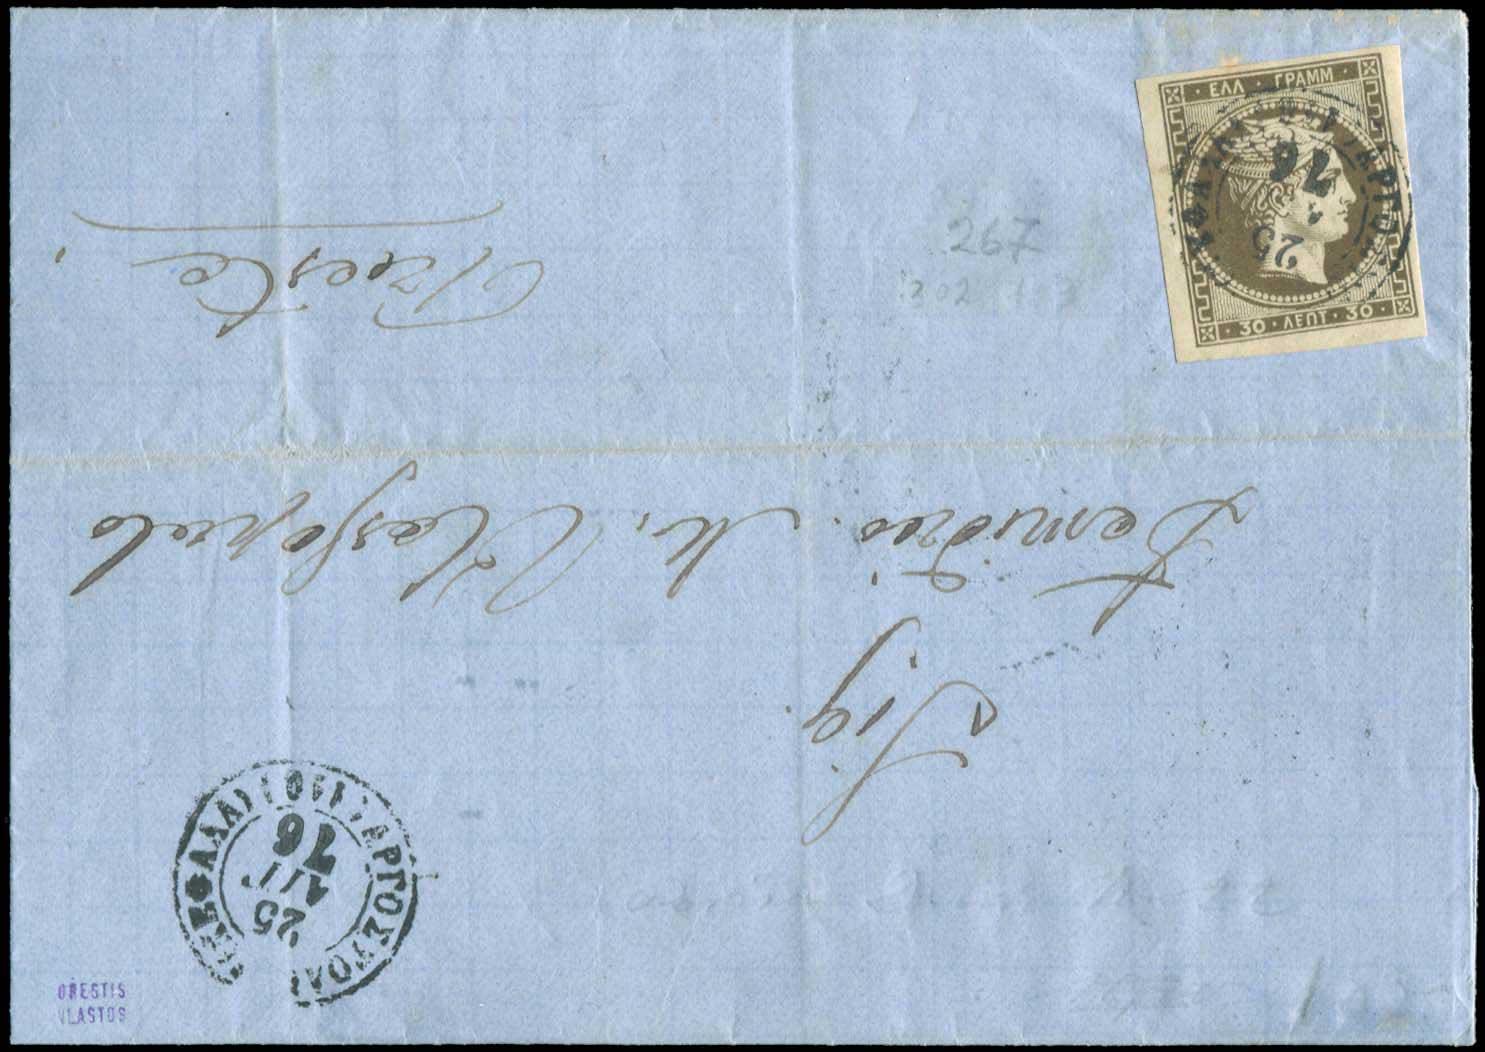 Lot 194 - -  LARGE HERMES HEAD 1876 paris printing -  A. Karamitsos Postal & Live Internet Auction 678 General Philatelic Auction